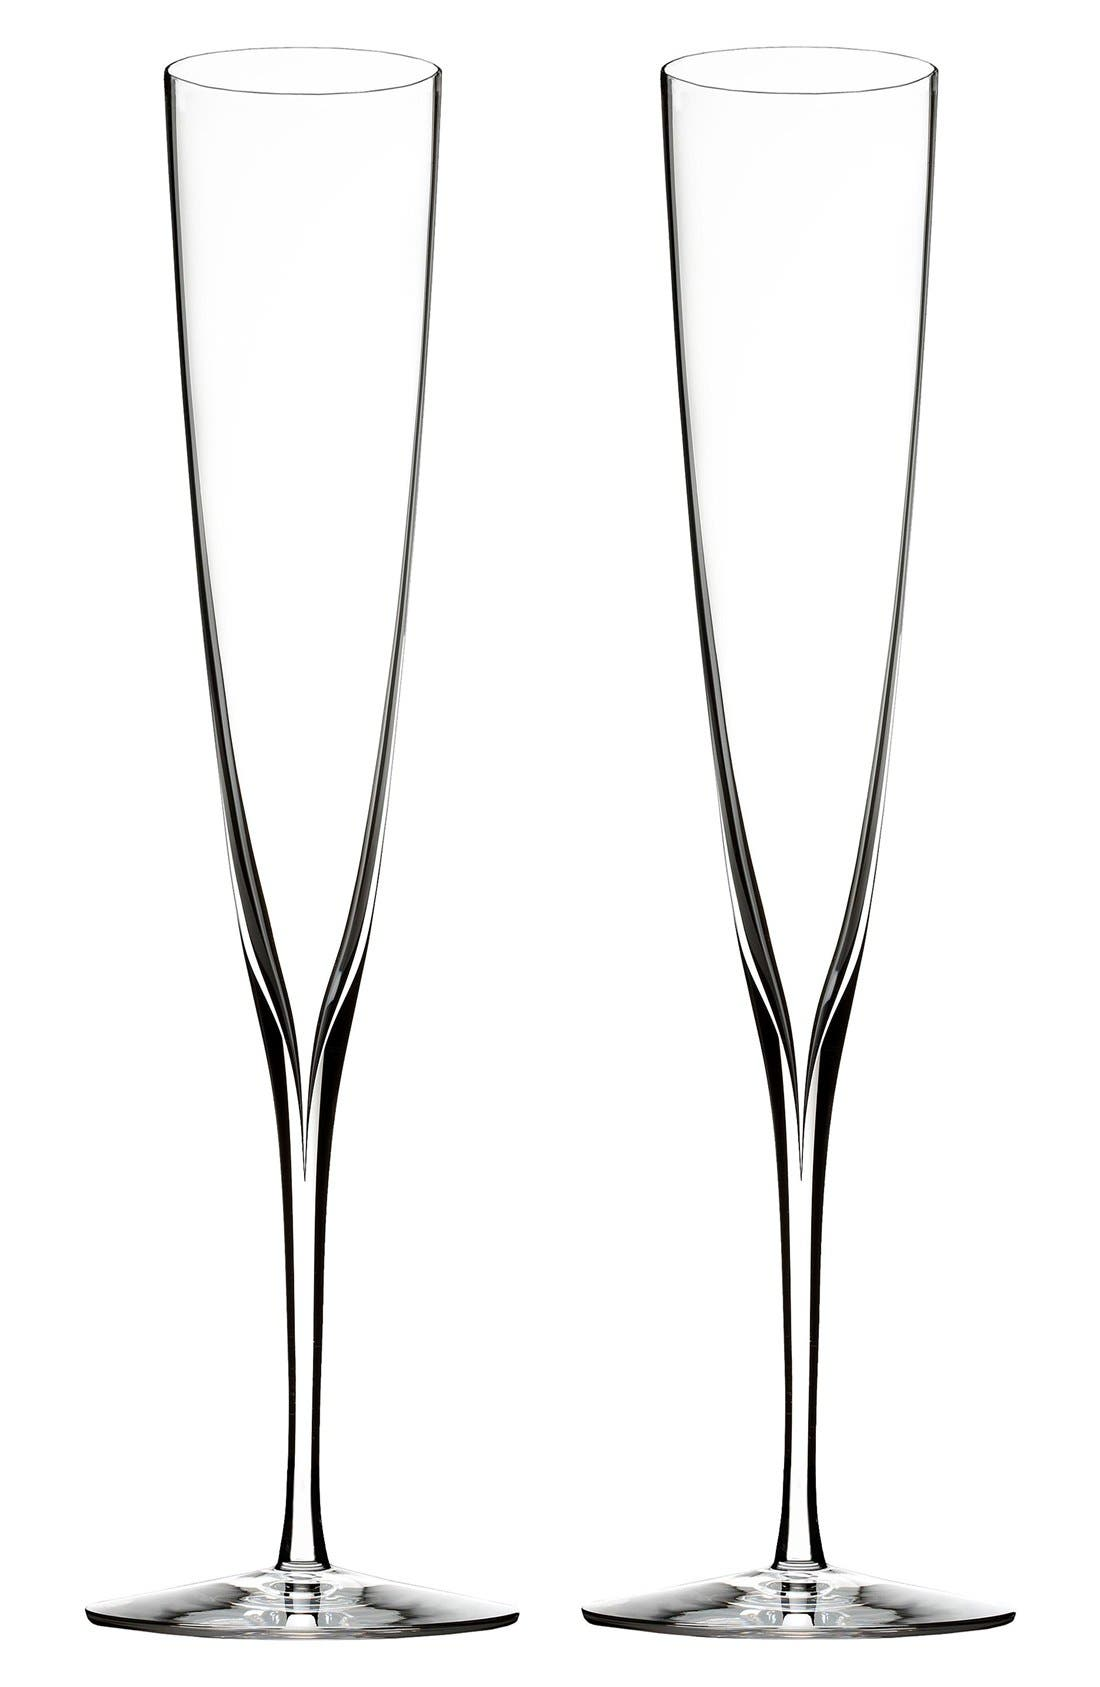 Main Image - Waterford 'Elegance' Fine Crystal Champagne Trumpet Flutes (Set of 2)